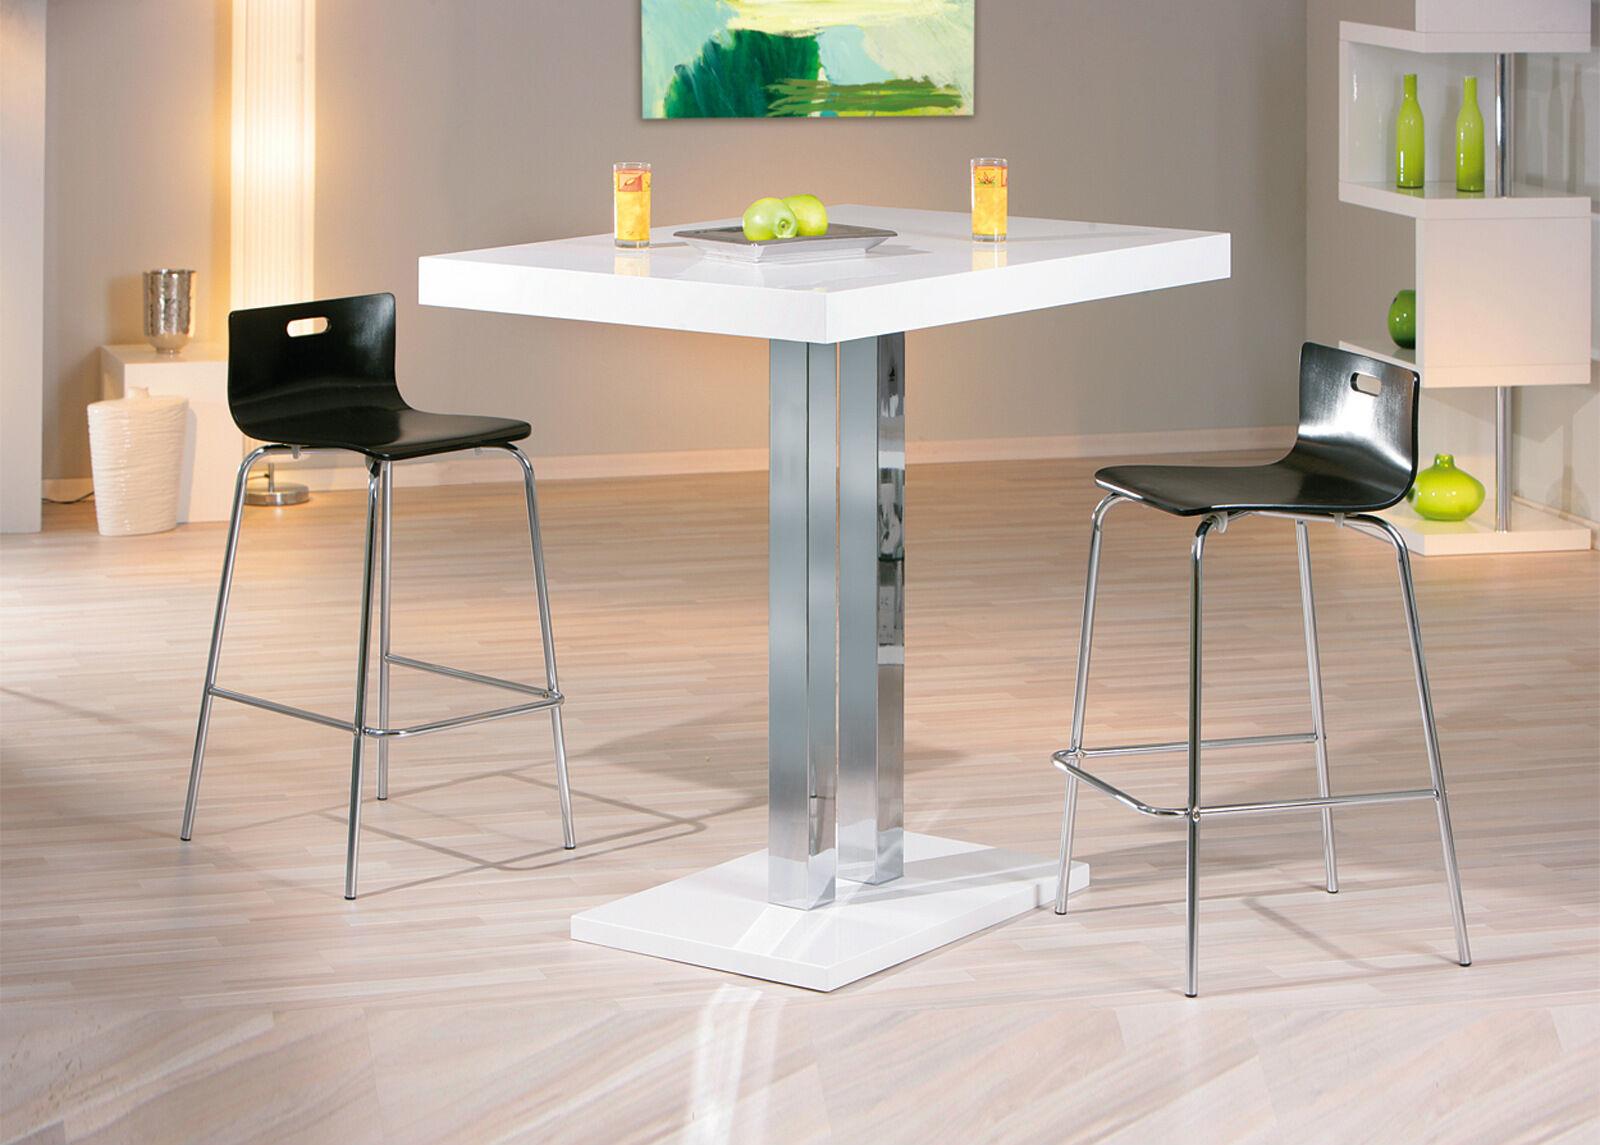 InterLink Baaripöytä PALAZZI 120x80 cm